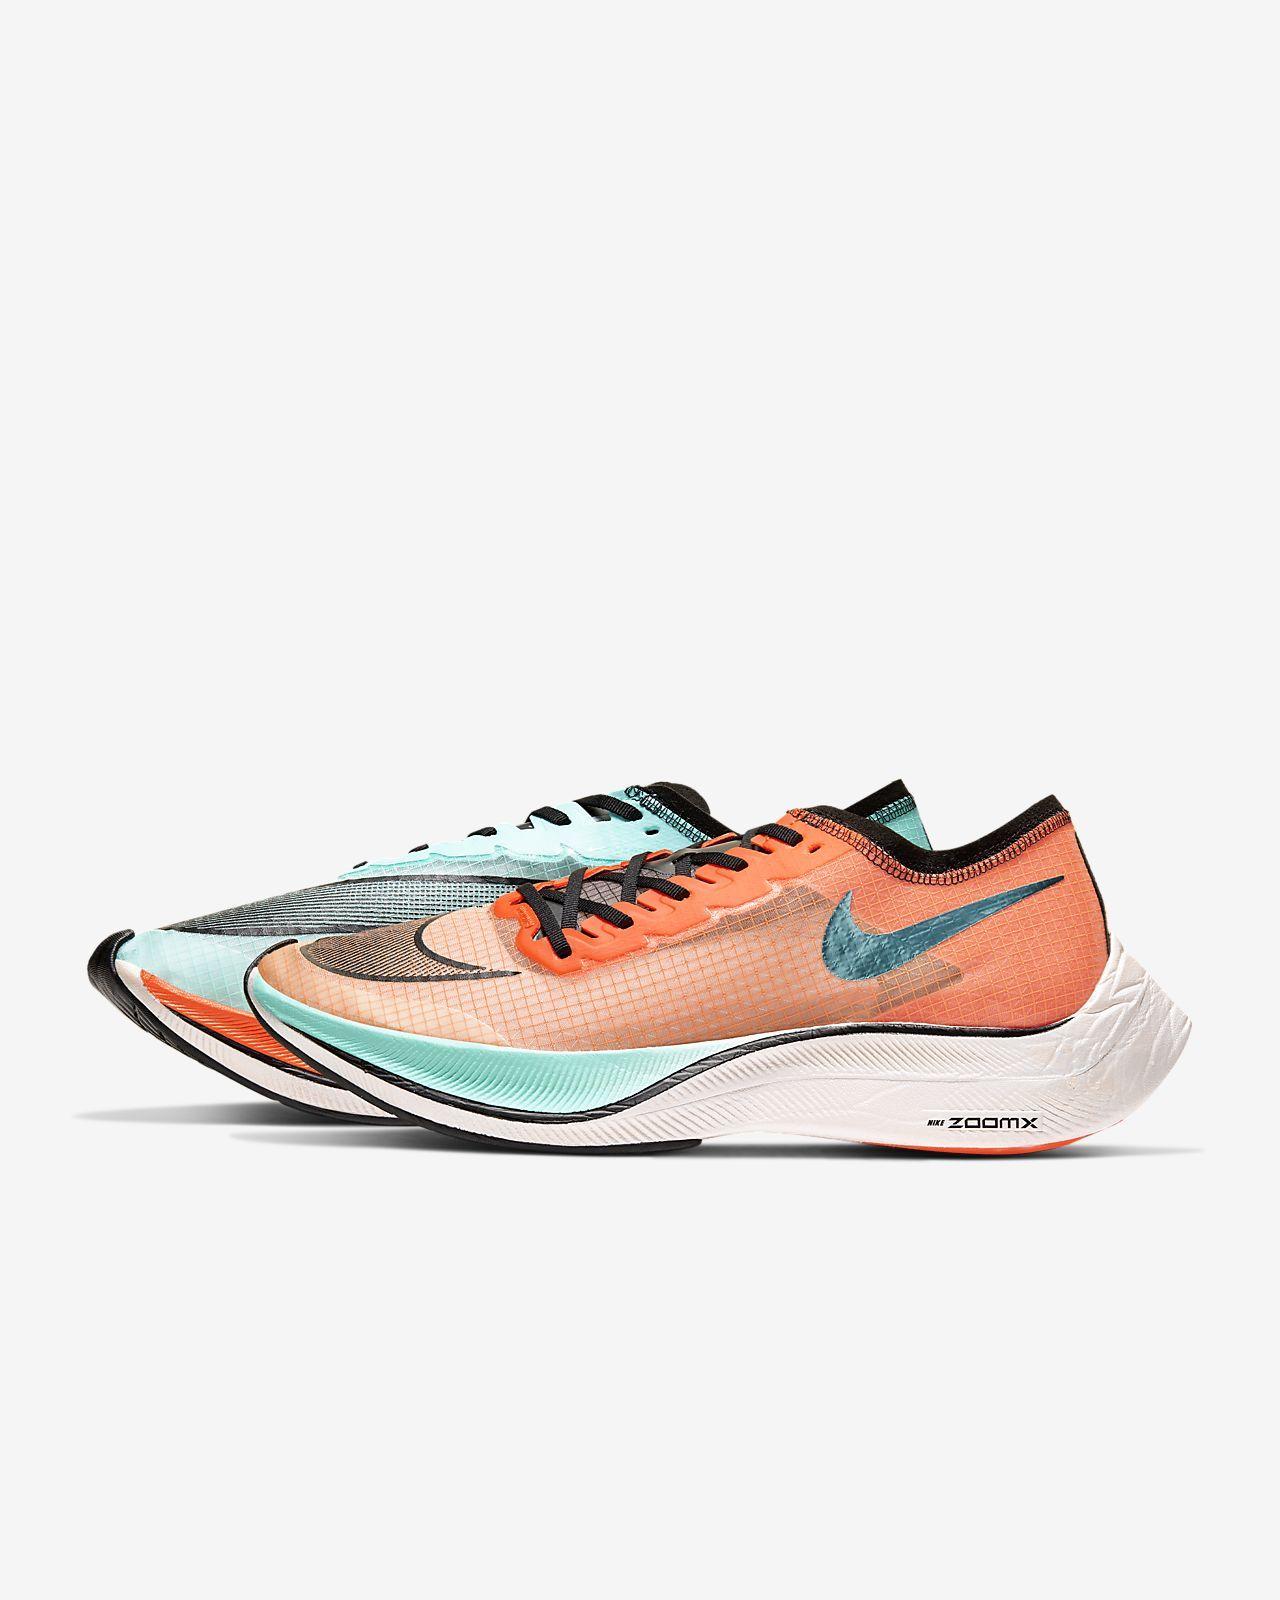 Nike Zoomx Vaporfly Next Running Shoe Nike Com Nike Running Shoes Nike Zoom